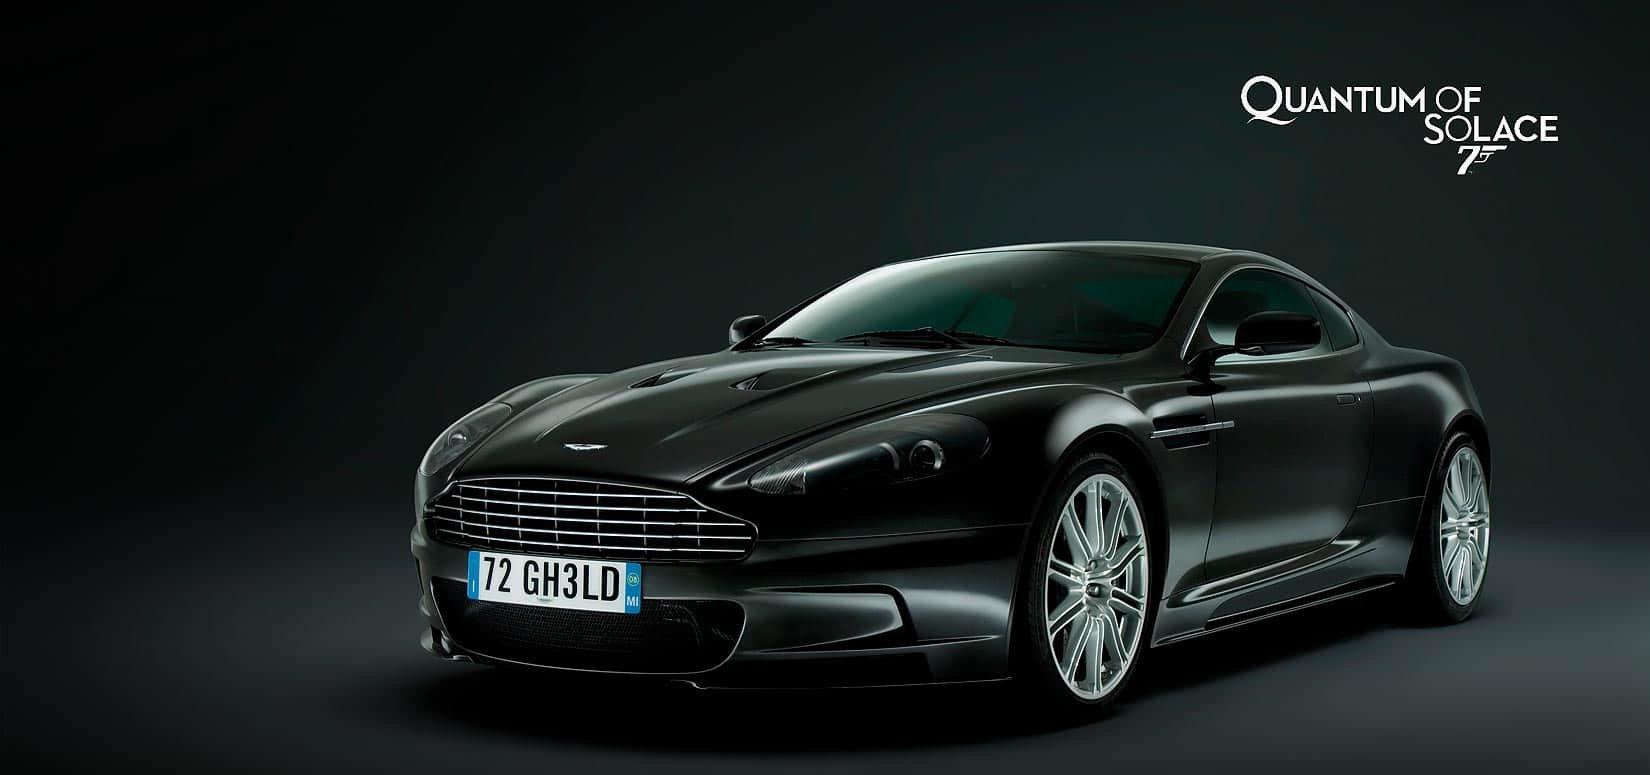 Aston Martin V12 DBS James Bond